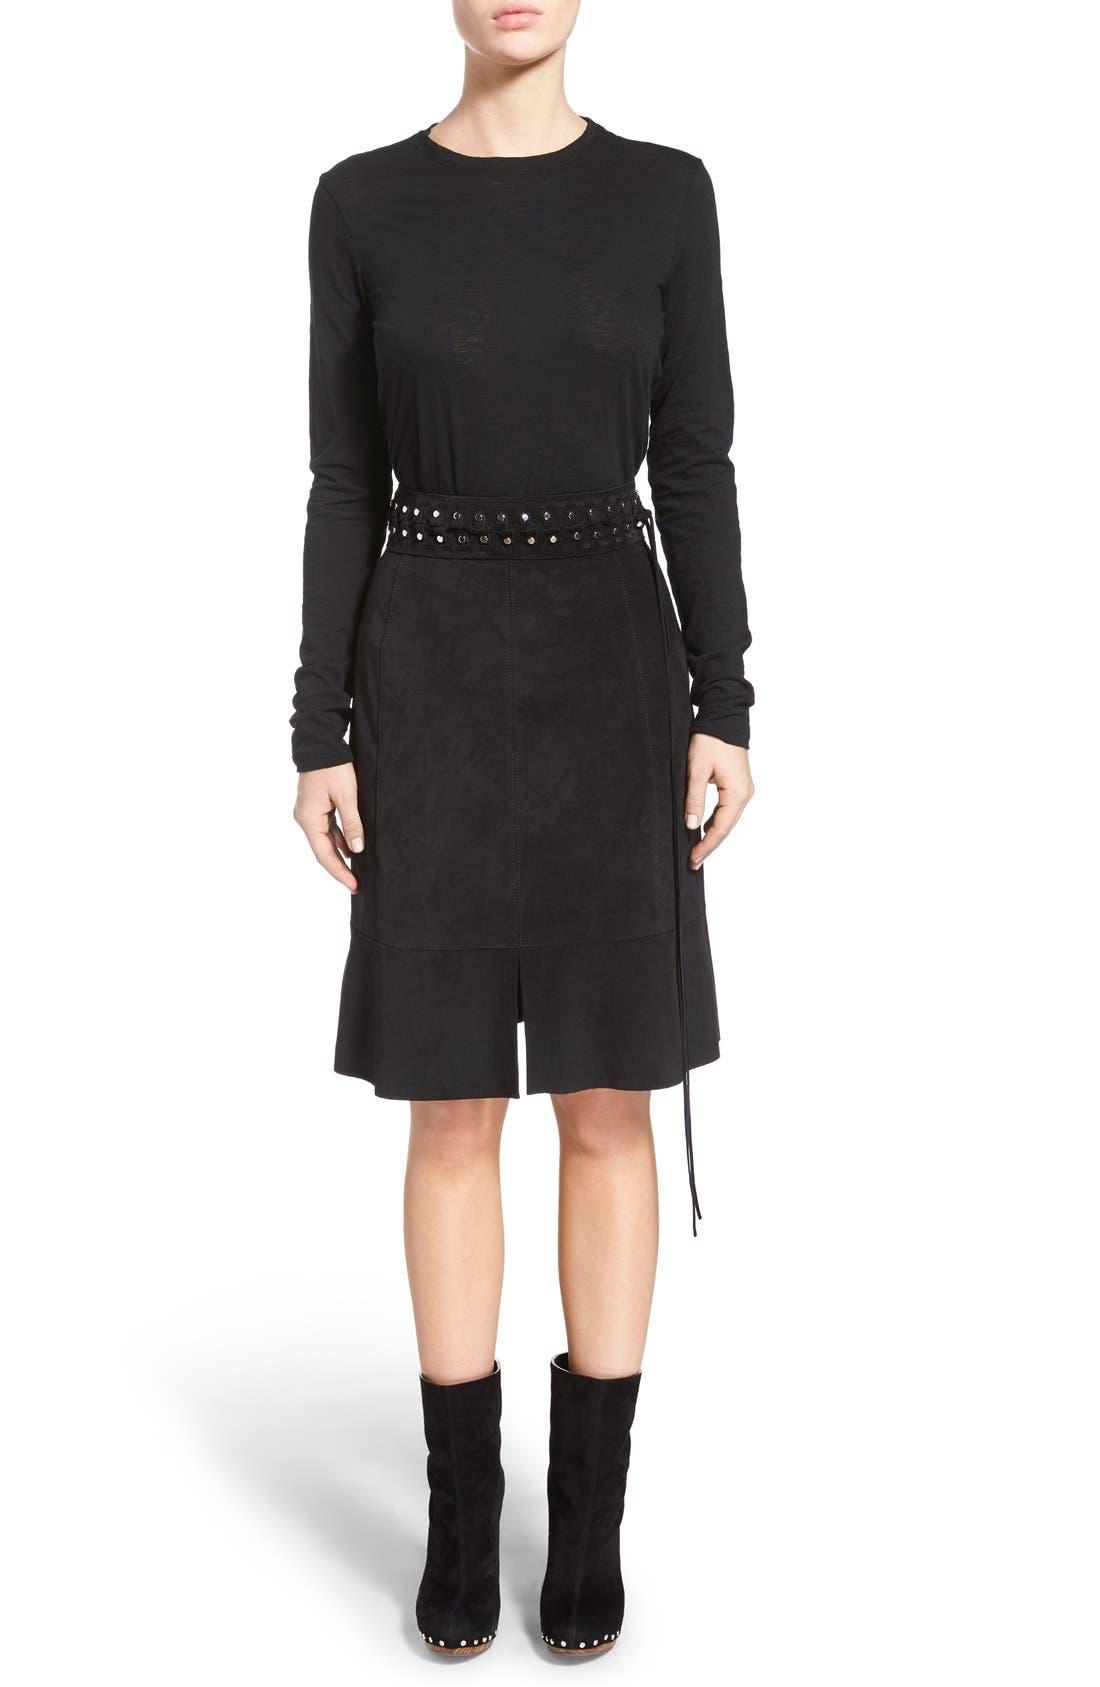 Alternate Image 1 Selected - Proenza Schouler Tissue Jersey Long Sleeve Tee